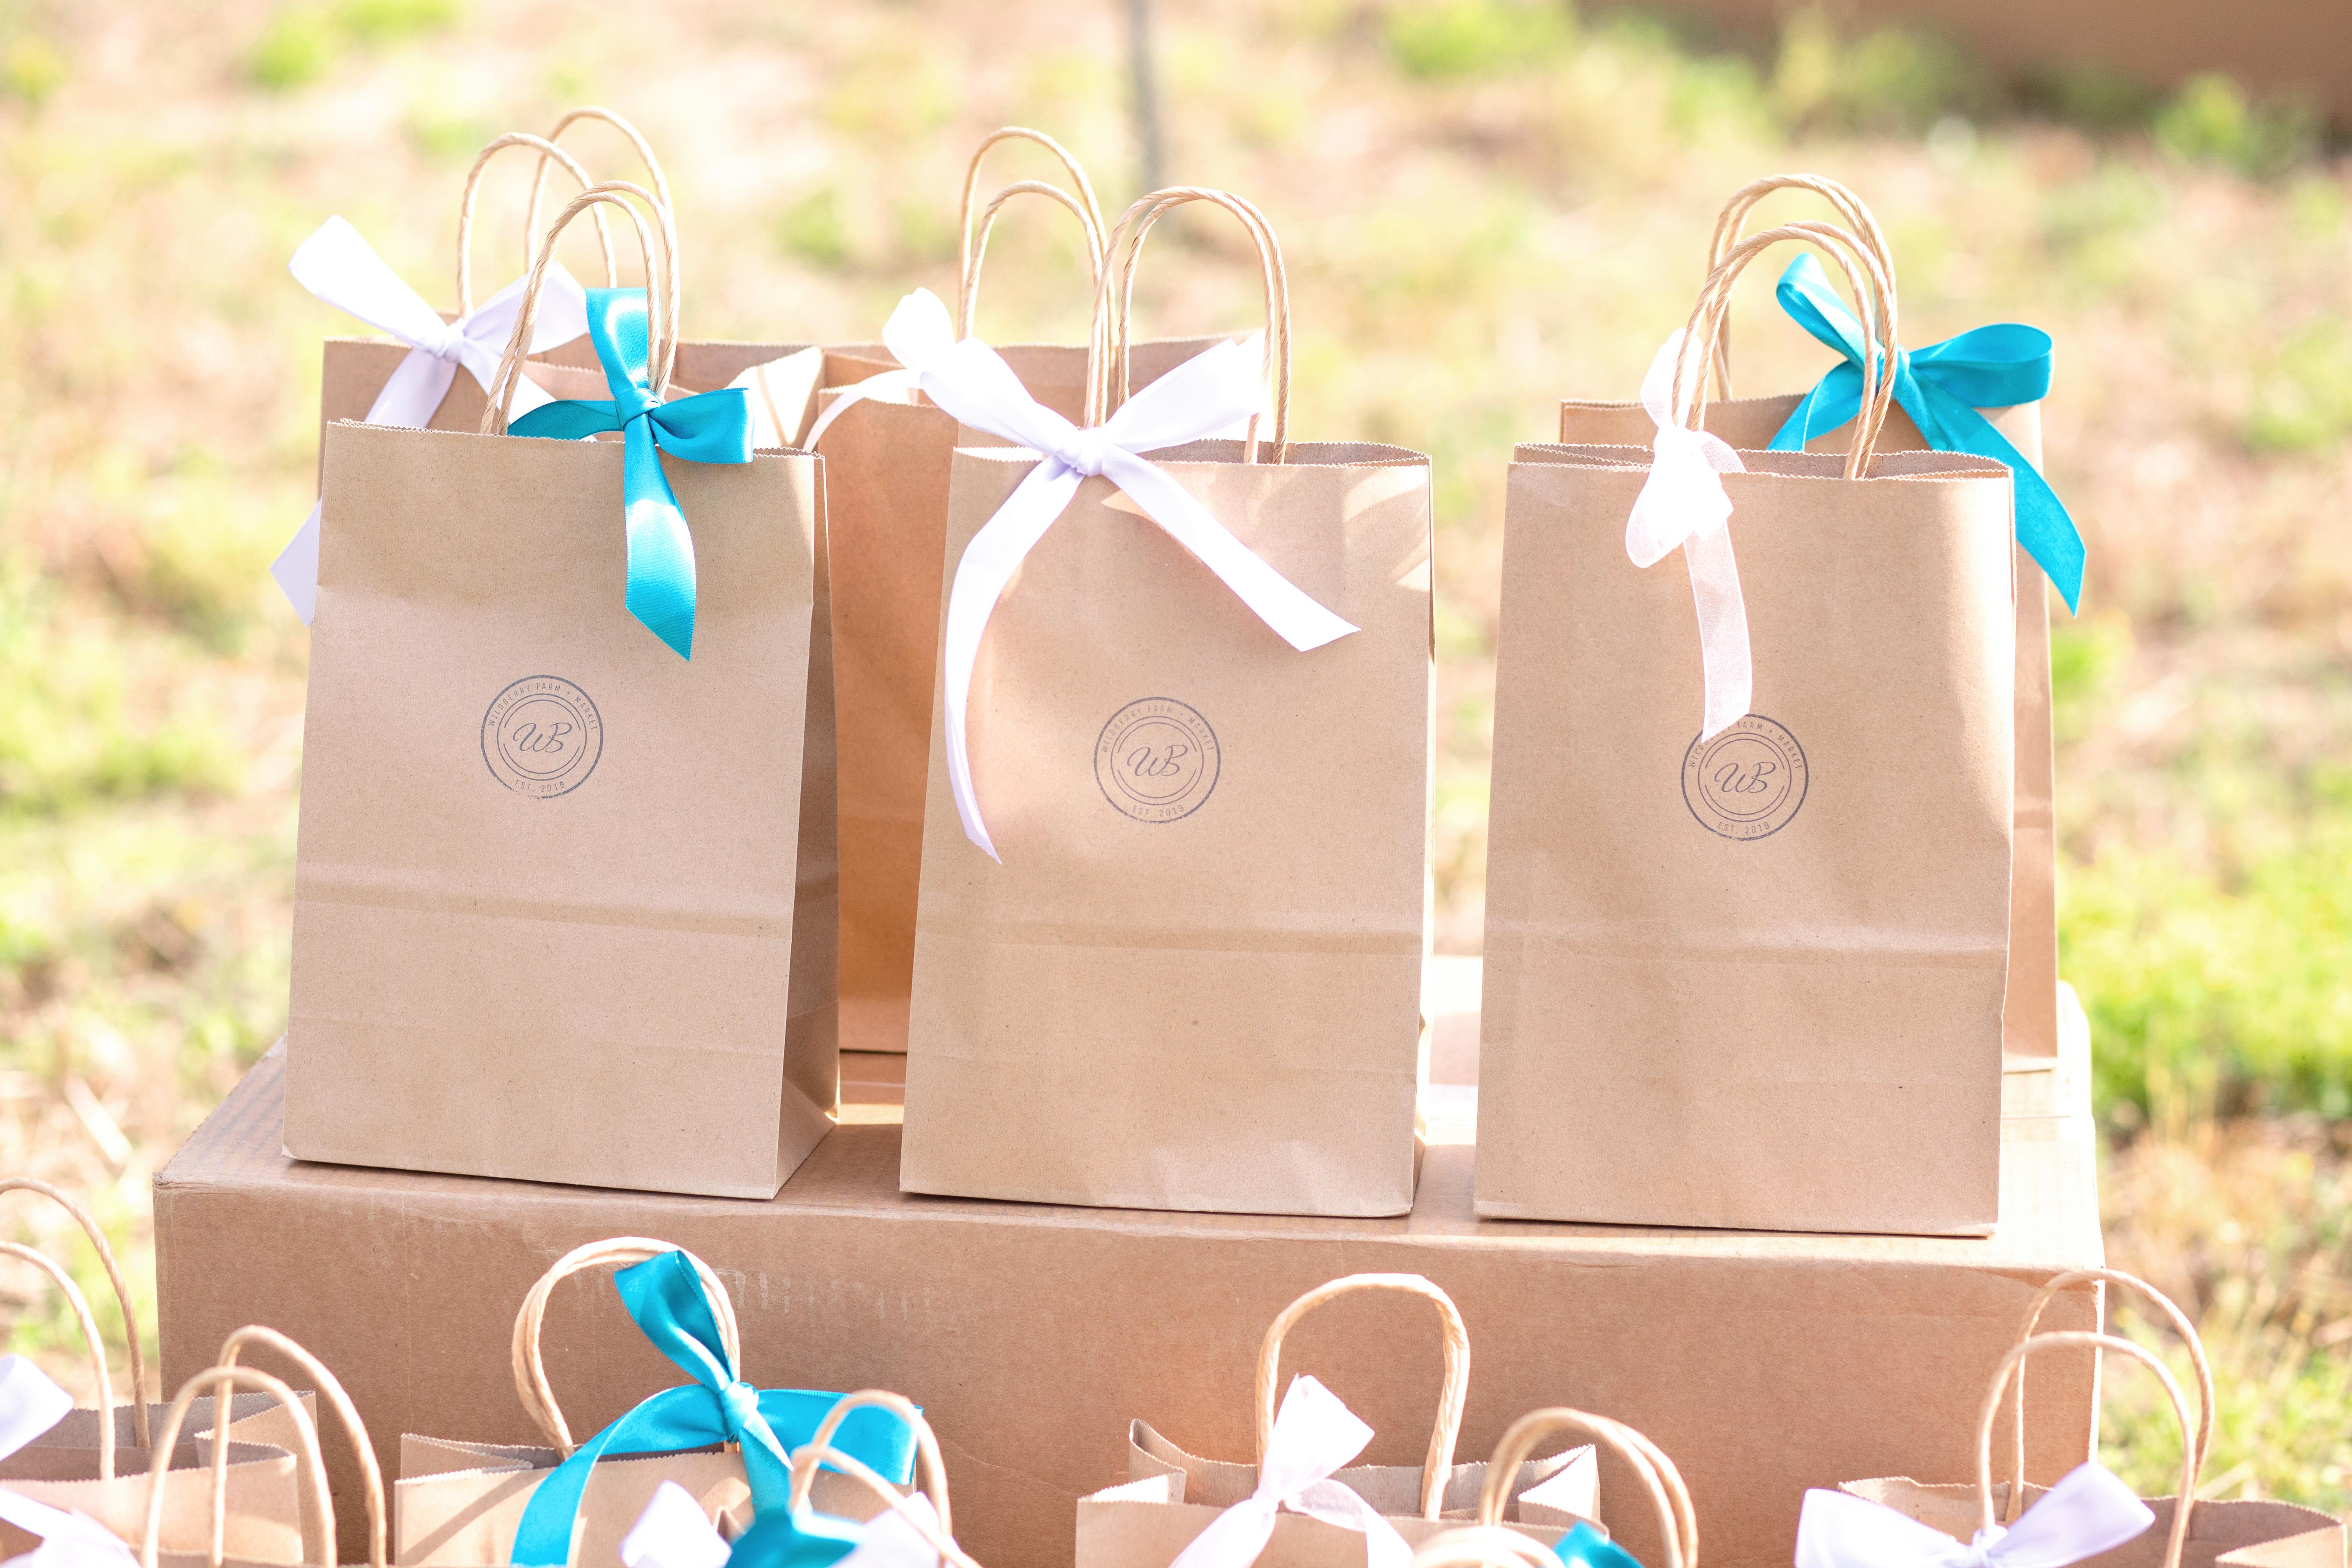 Vendor Market Goodie Bags